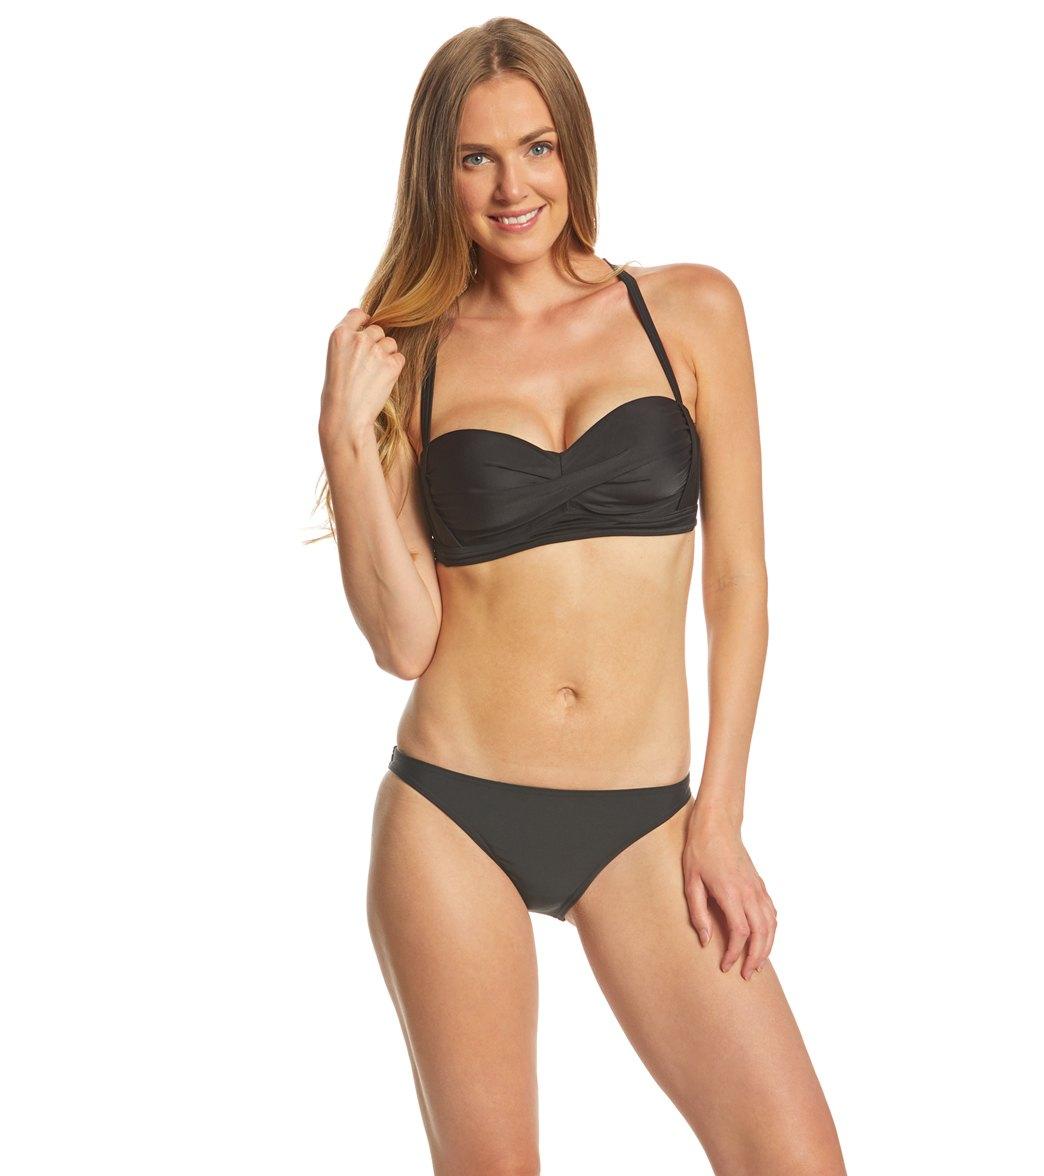 daa70132ce5 Prana Elysia Twist Bikini Top at SwimOutlet.com - Free Shipping